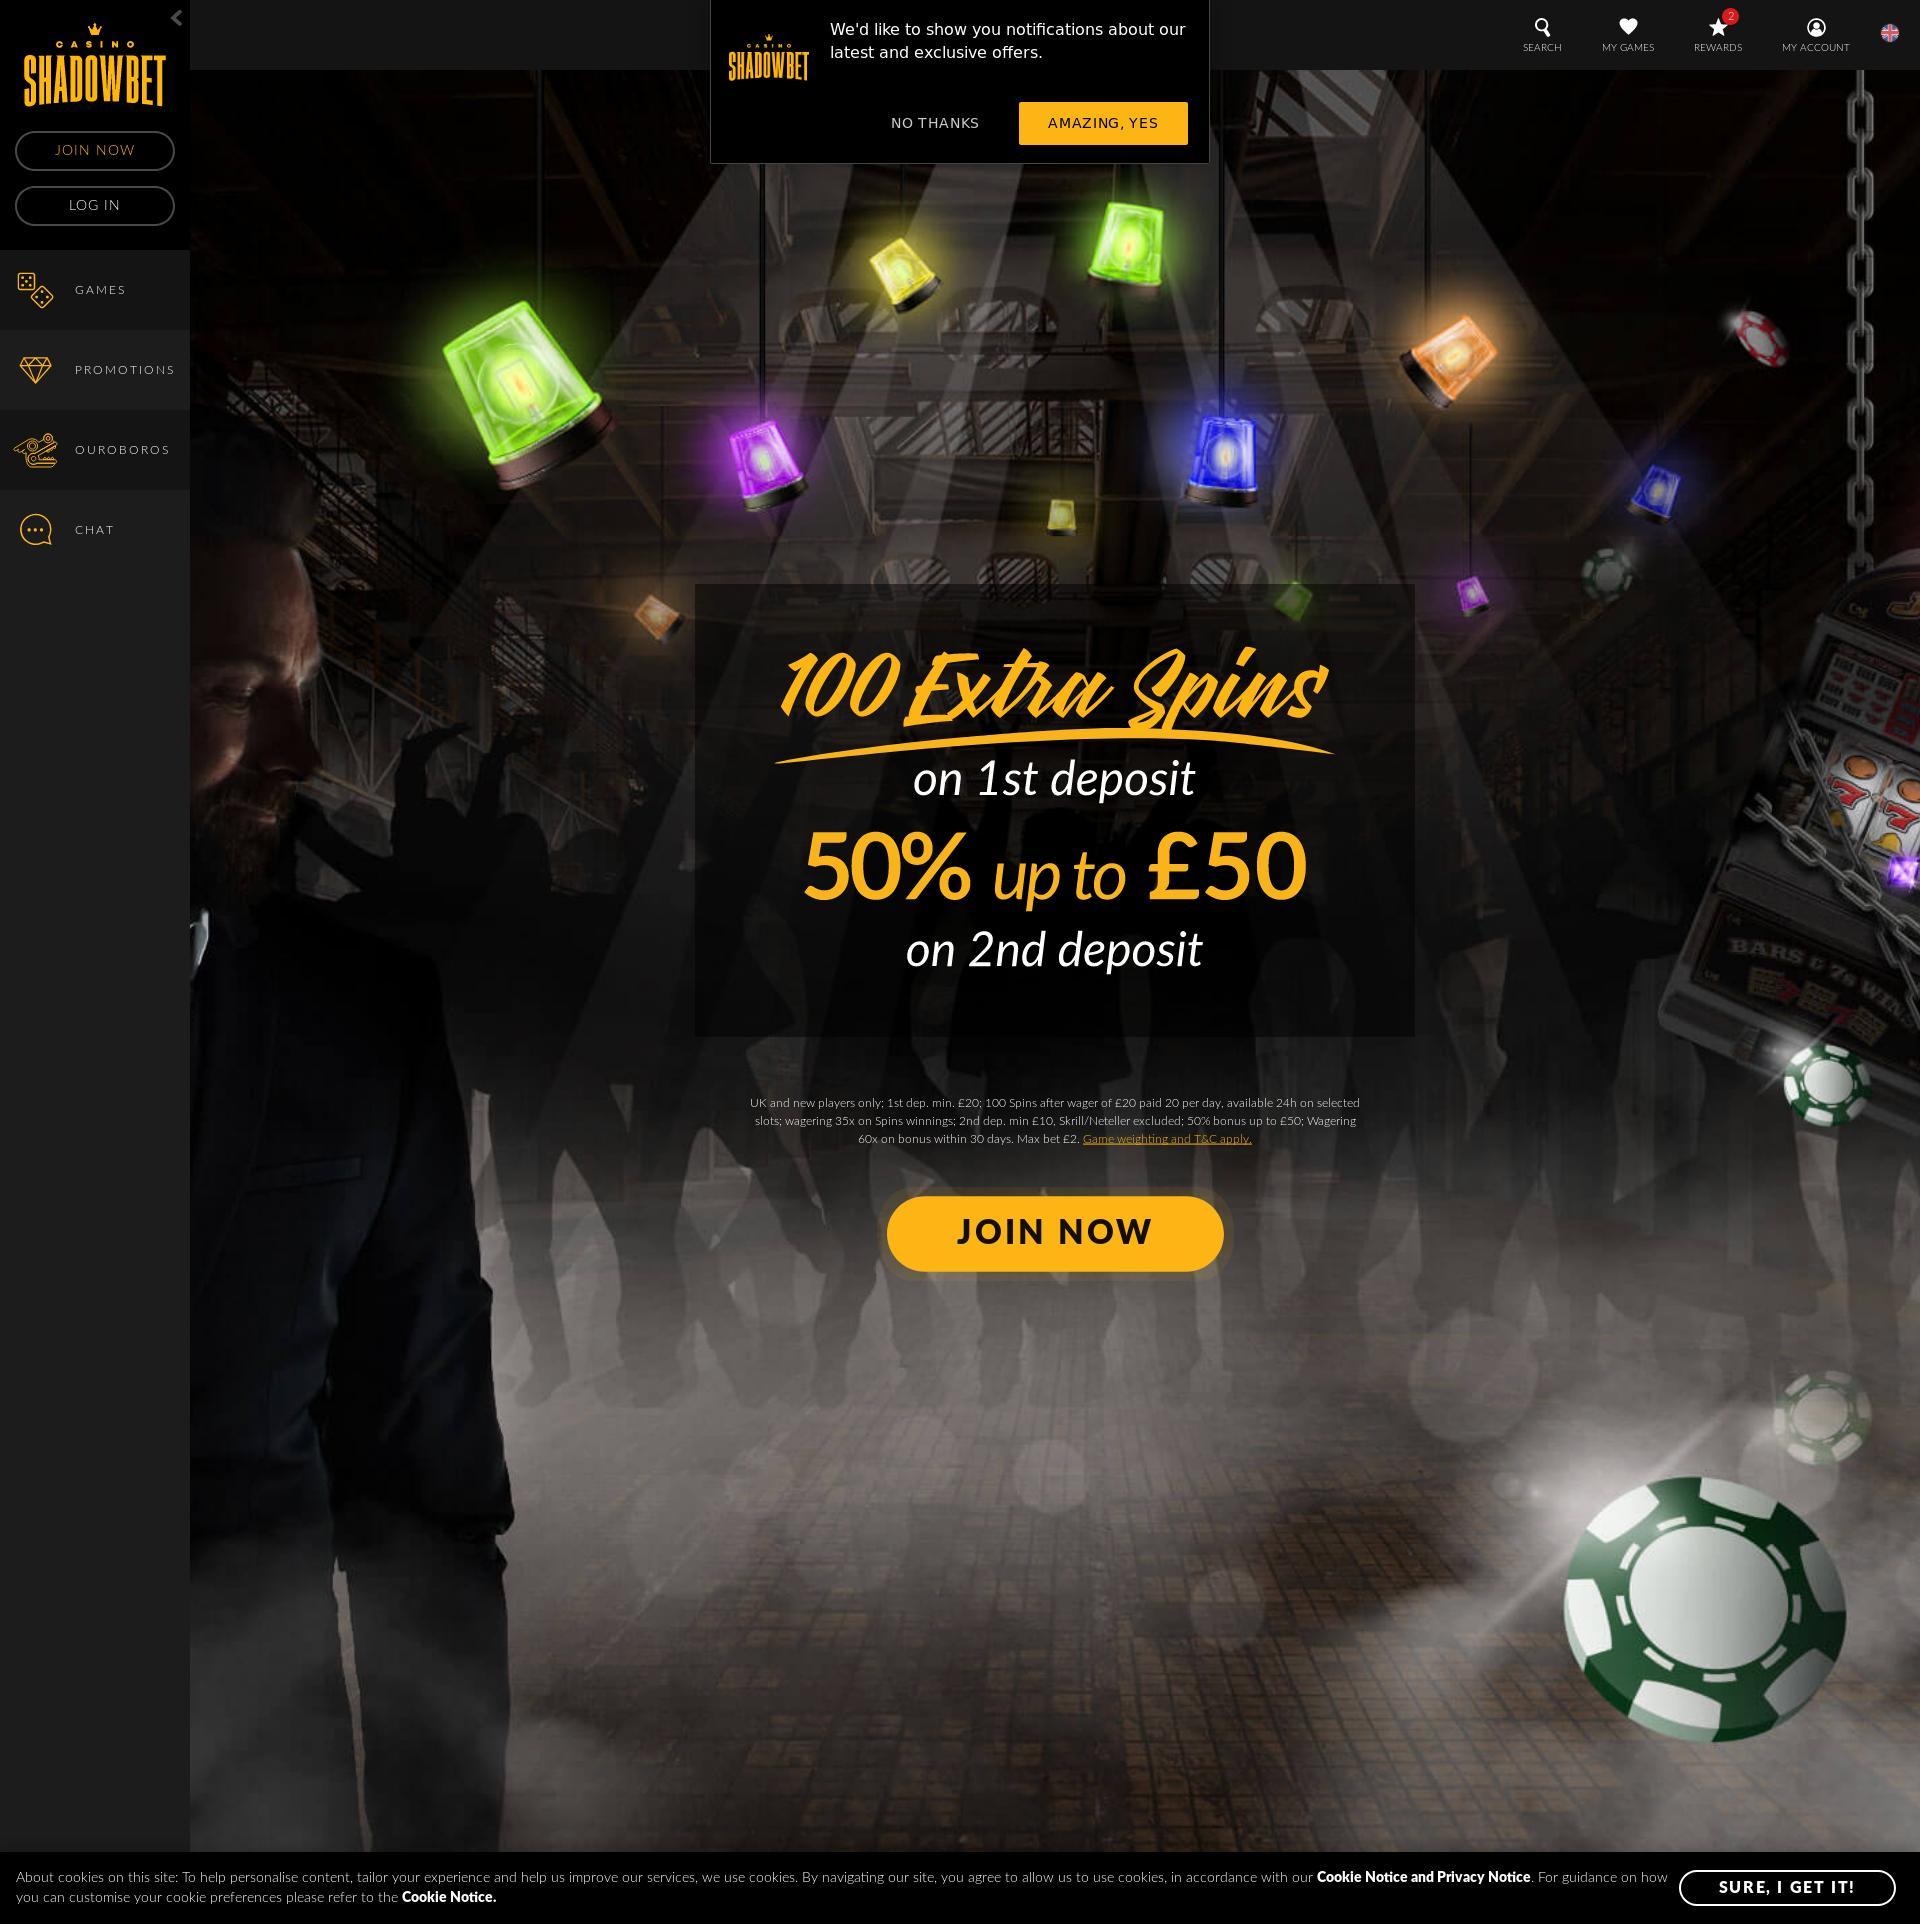 Shadowbet Casino Bonus